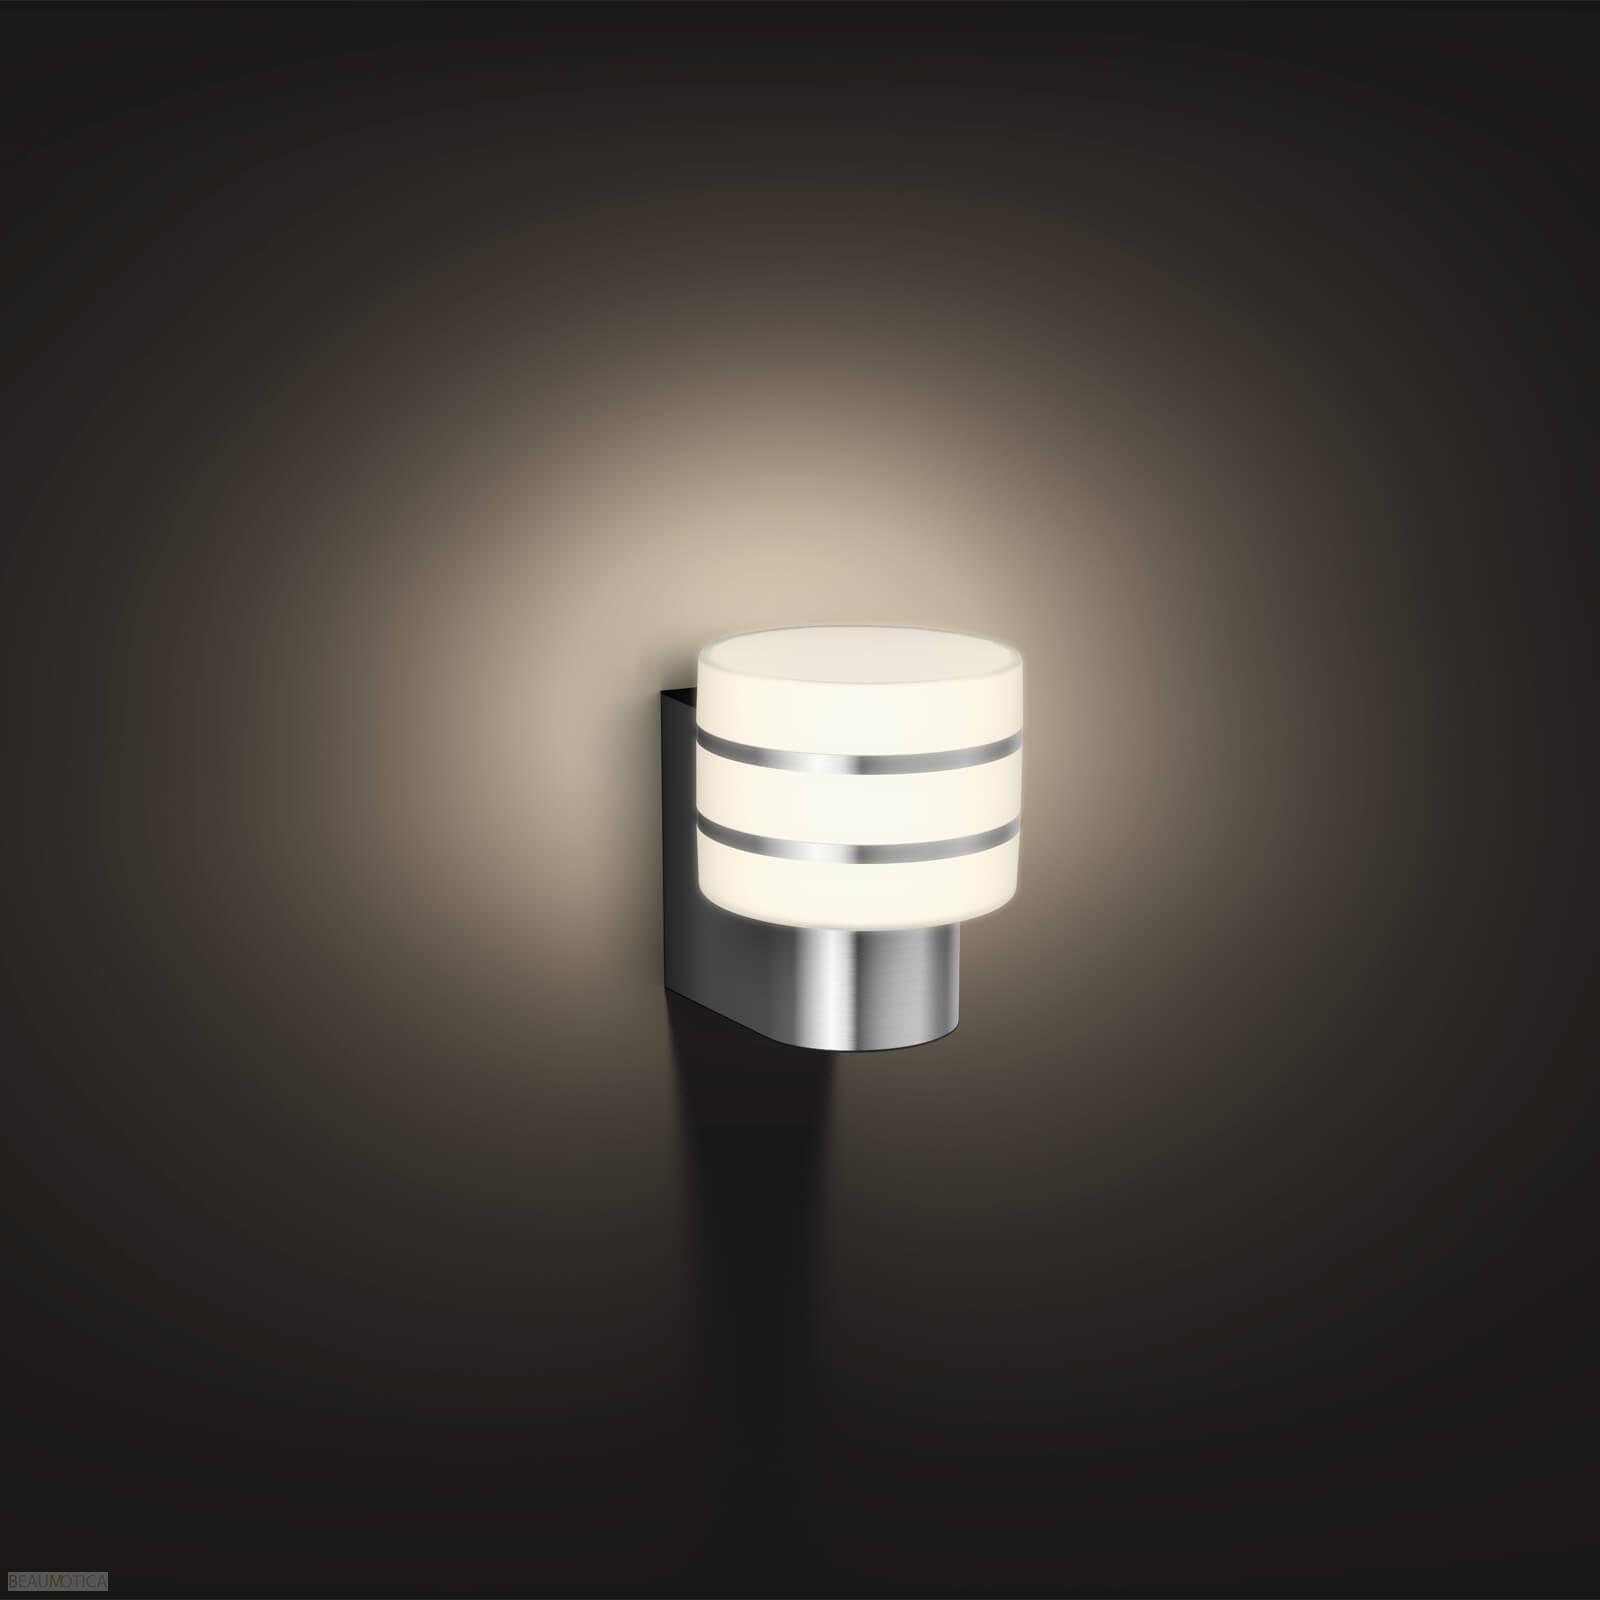 Philips Hue Outdoor Lampen.Philips Hue Outdoor Tuar Wandlamp Rvs White